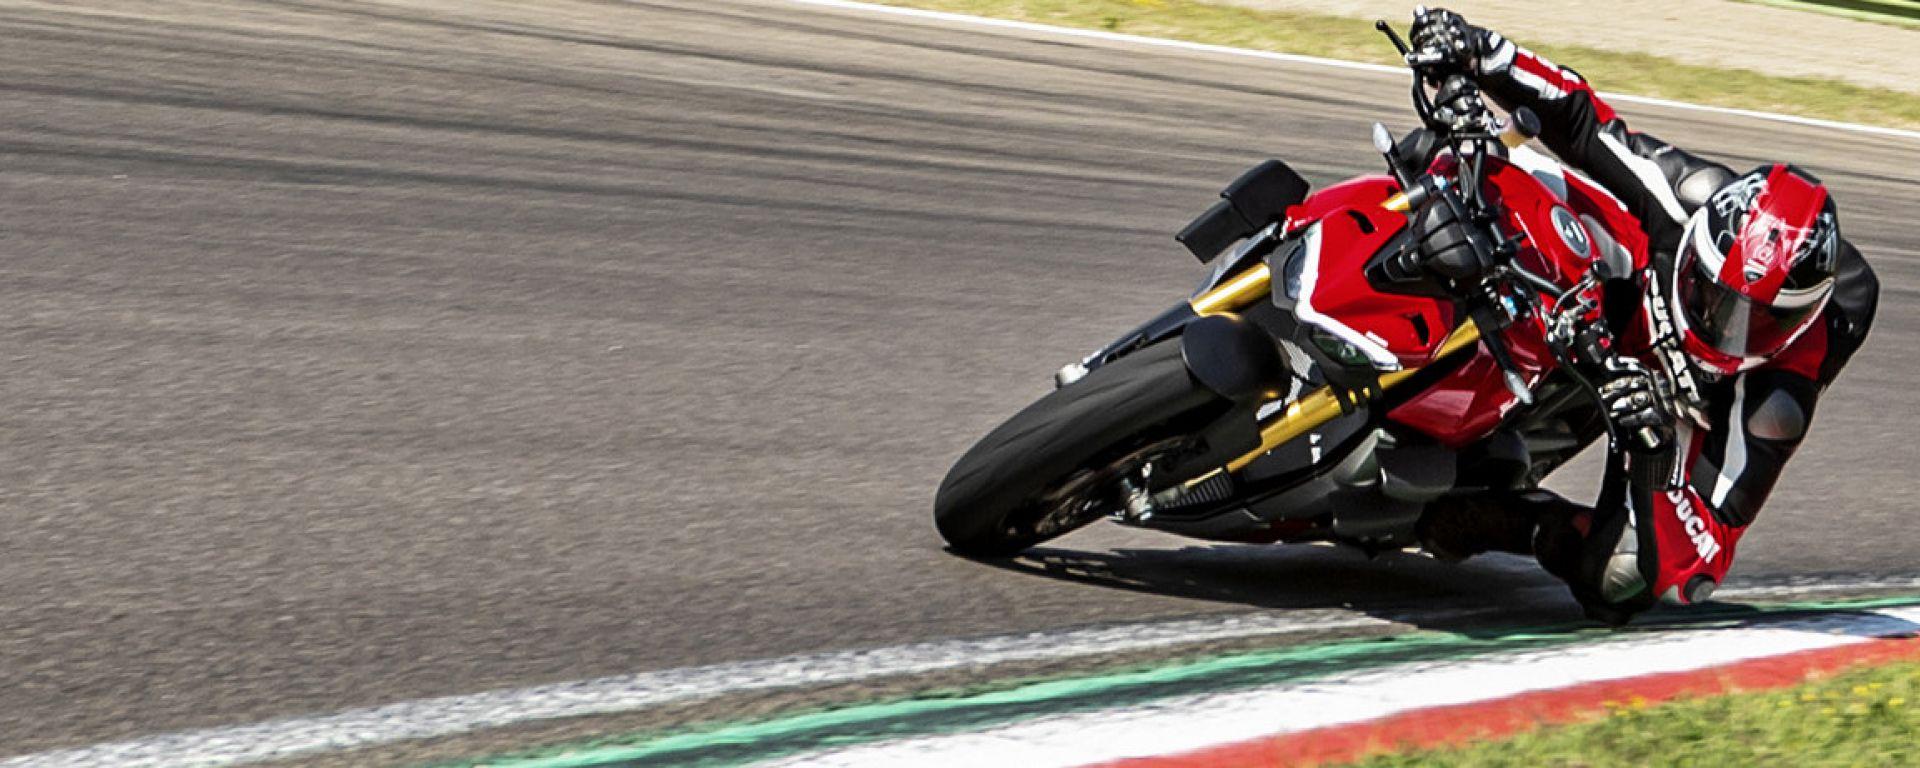 Nuova Ducati Streetfighter V4, una naked esagerata